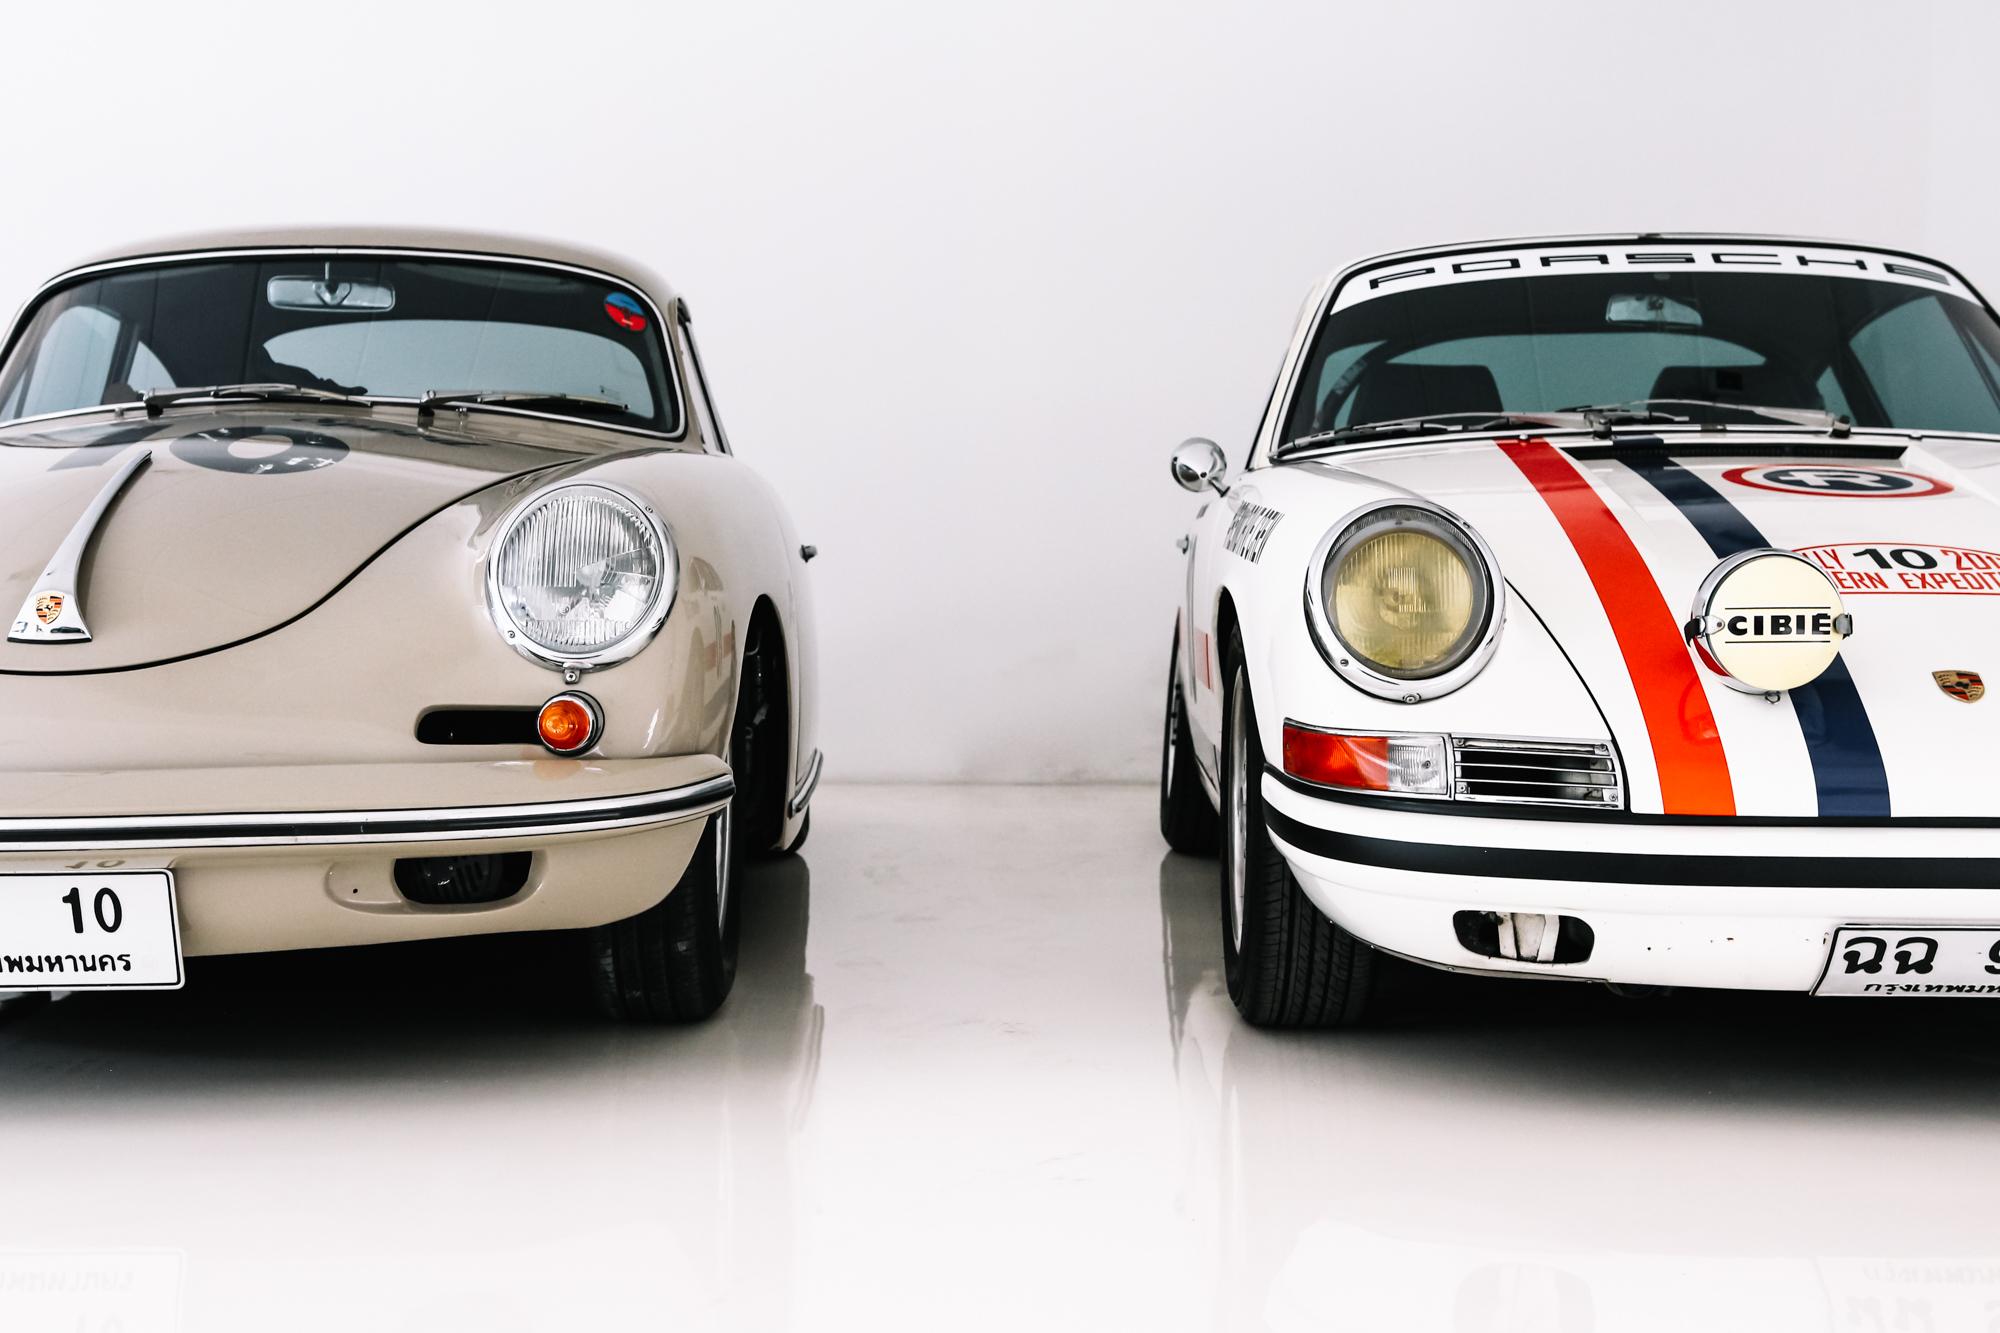 TeensterPorscheHouse97 Cozy Prix D'une Porsche 911 Gt1 Cars Trend